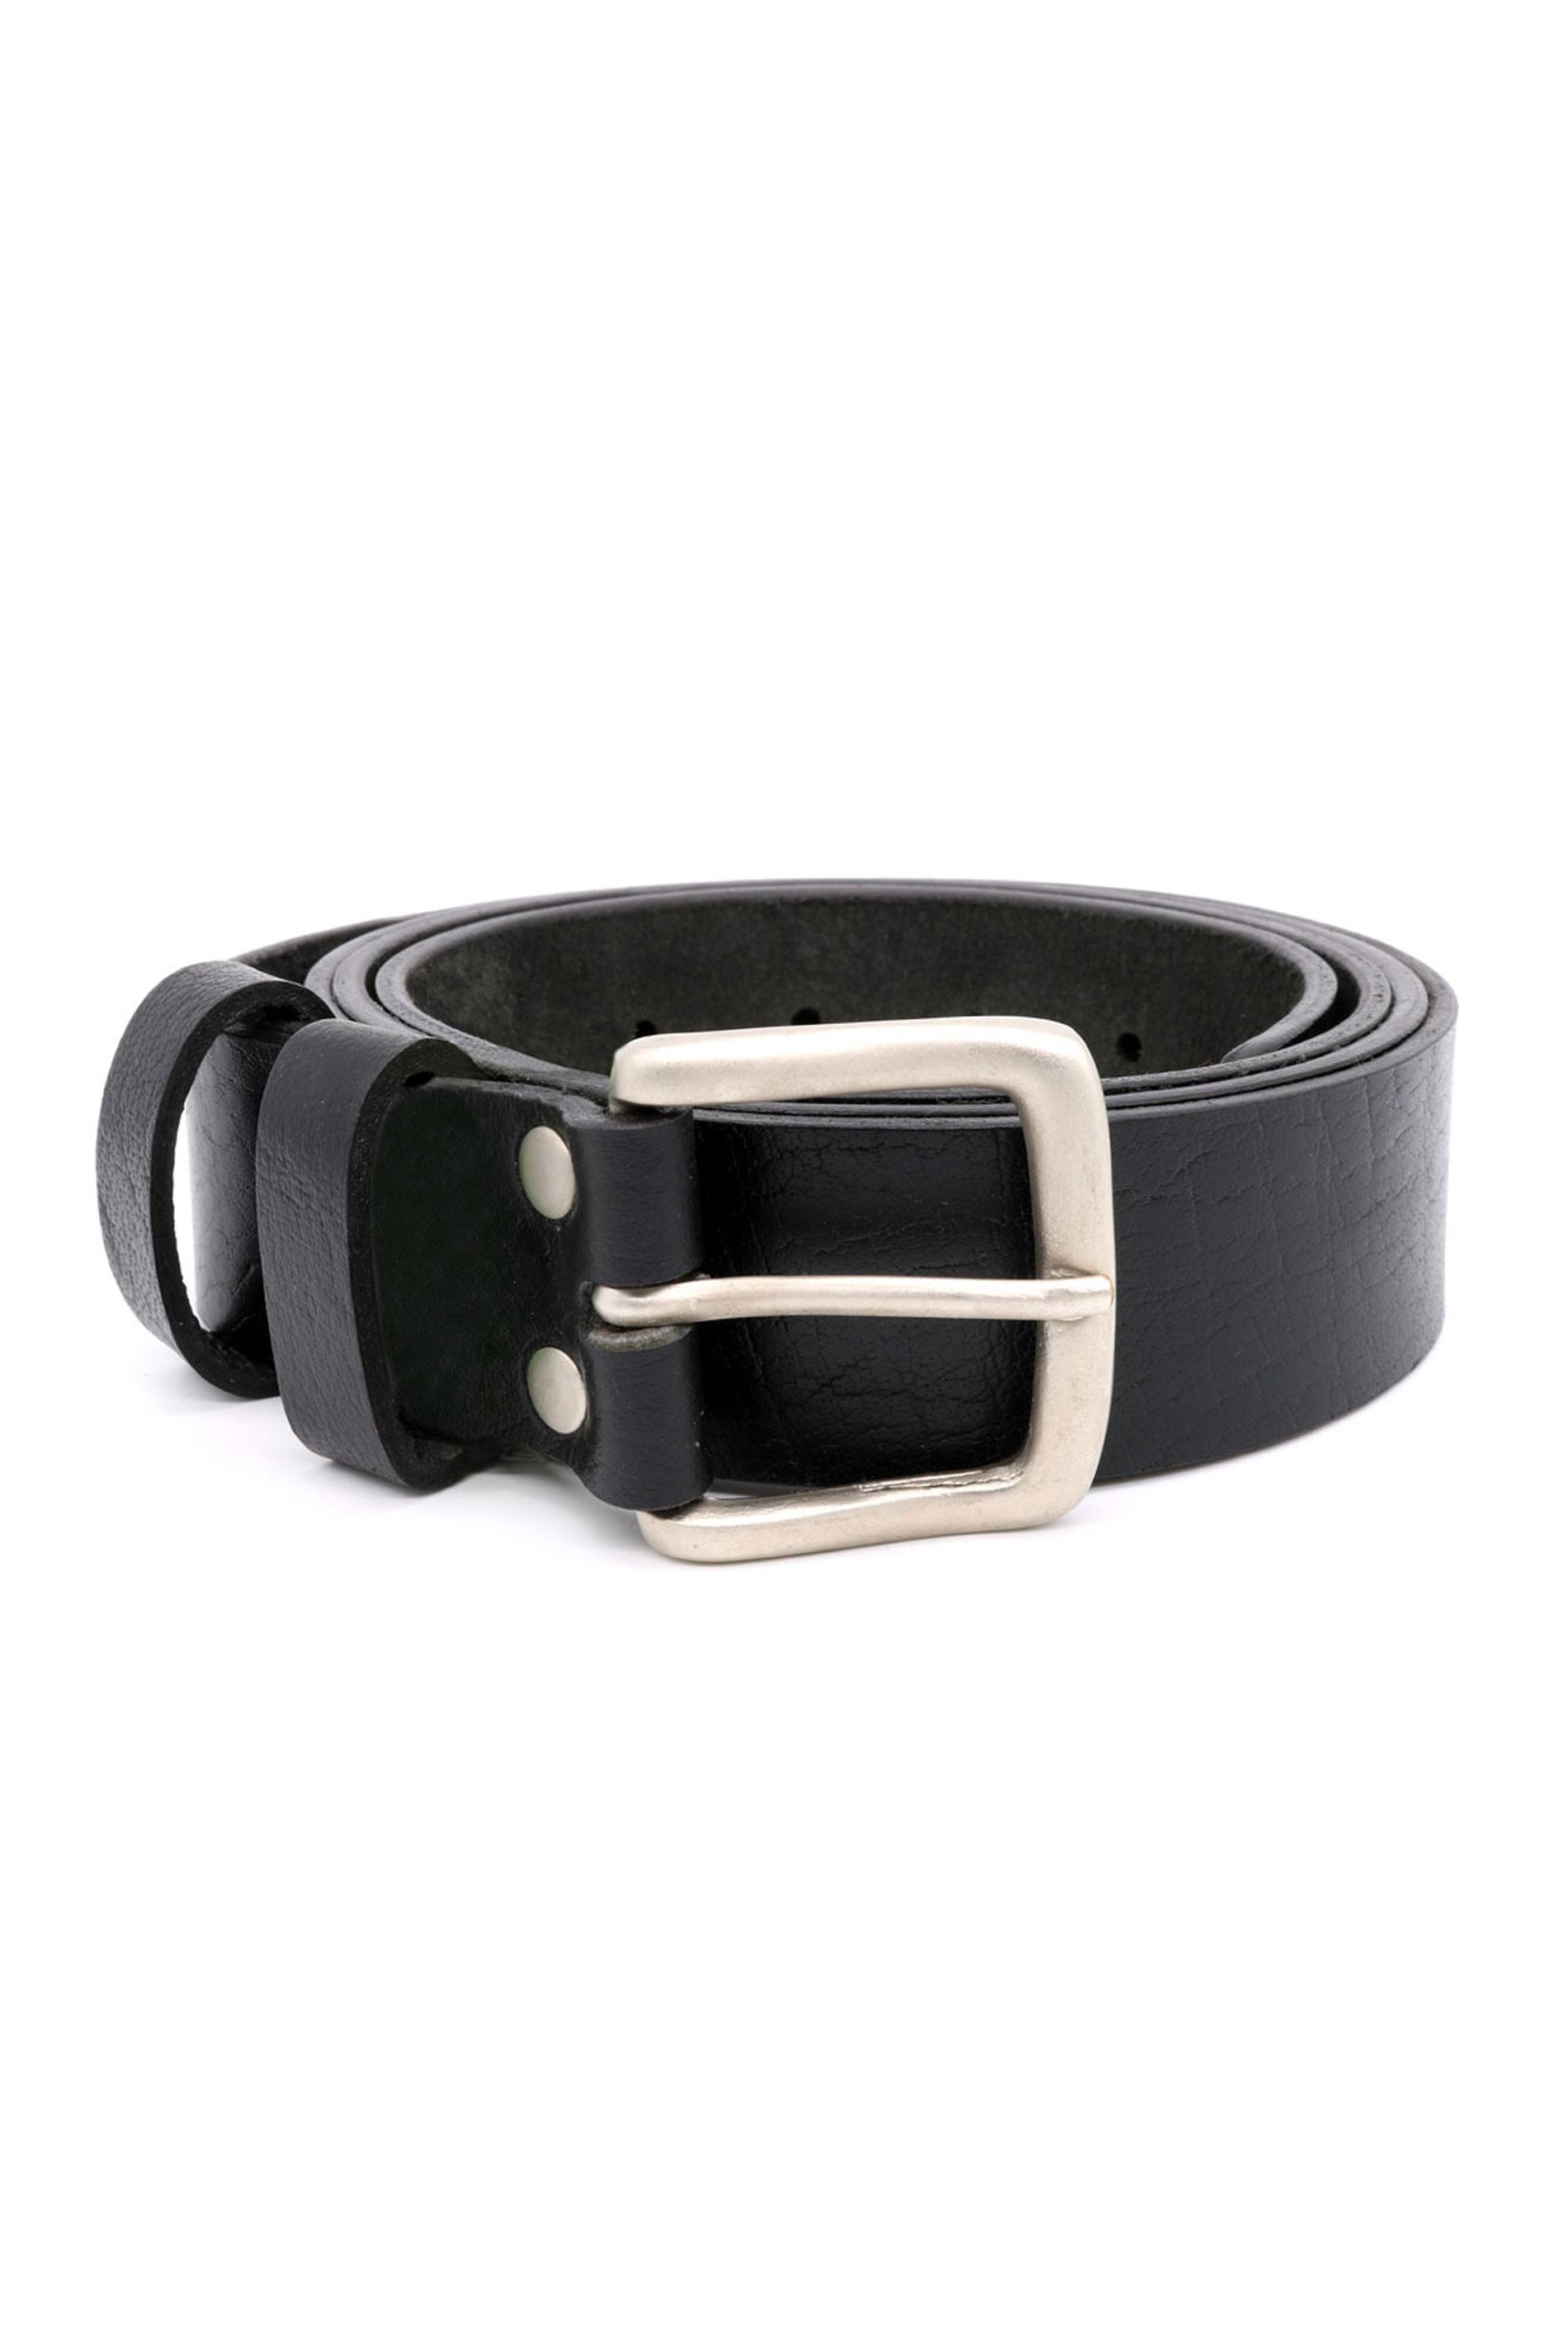 D555 Black Leather Belt